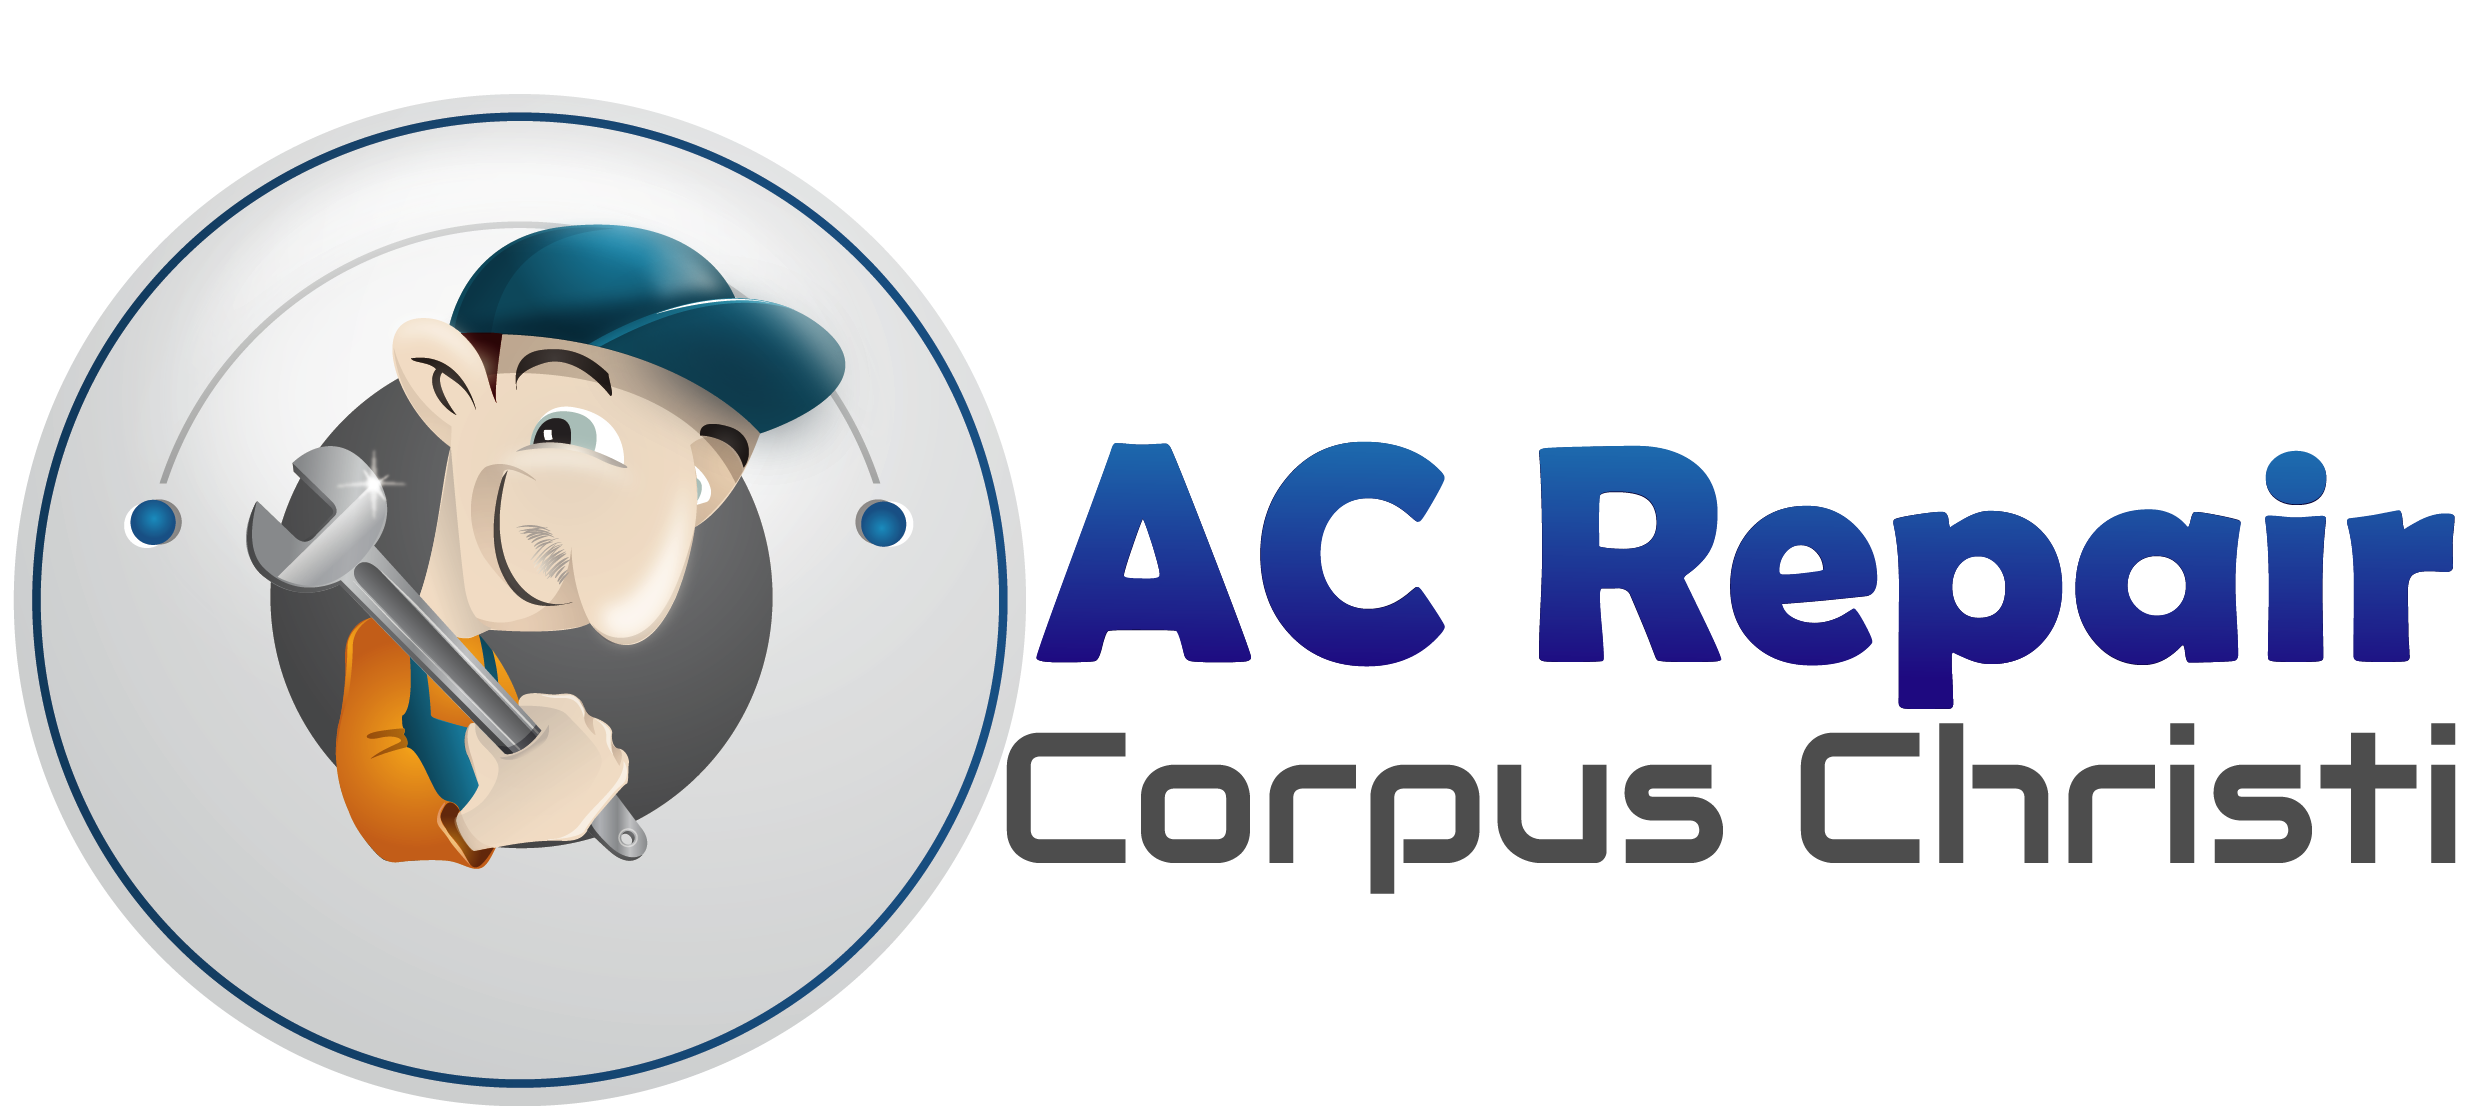 ACREPAIR-CORPUSCHRISTI.com